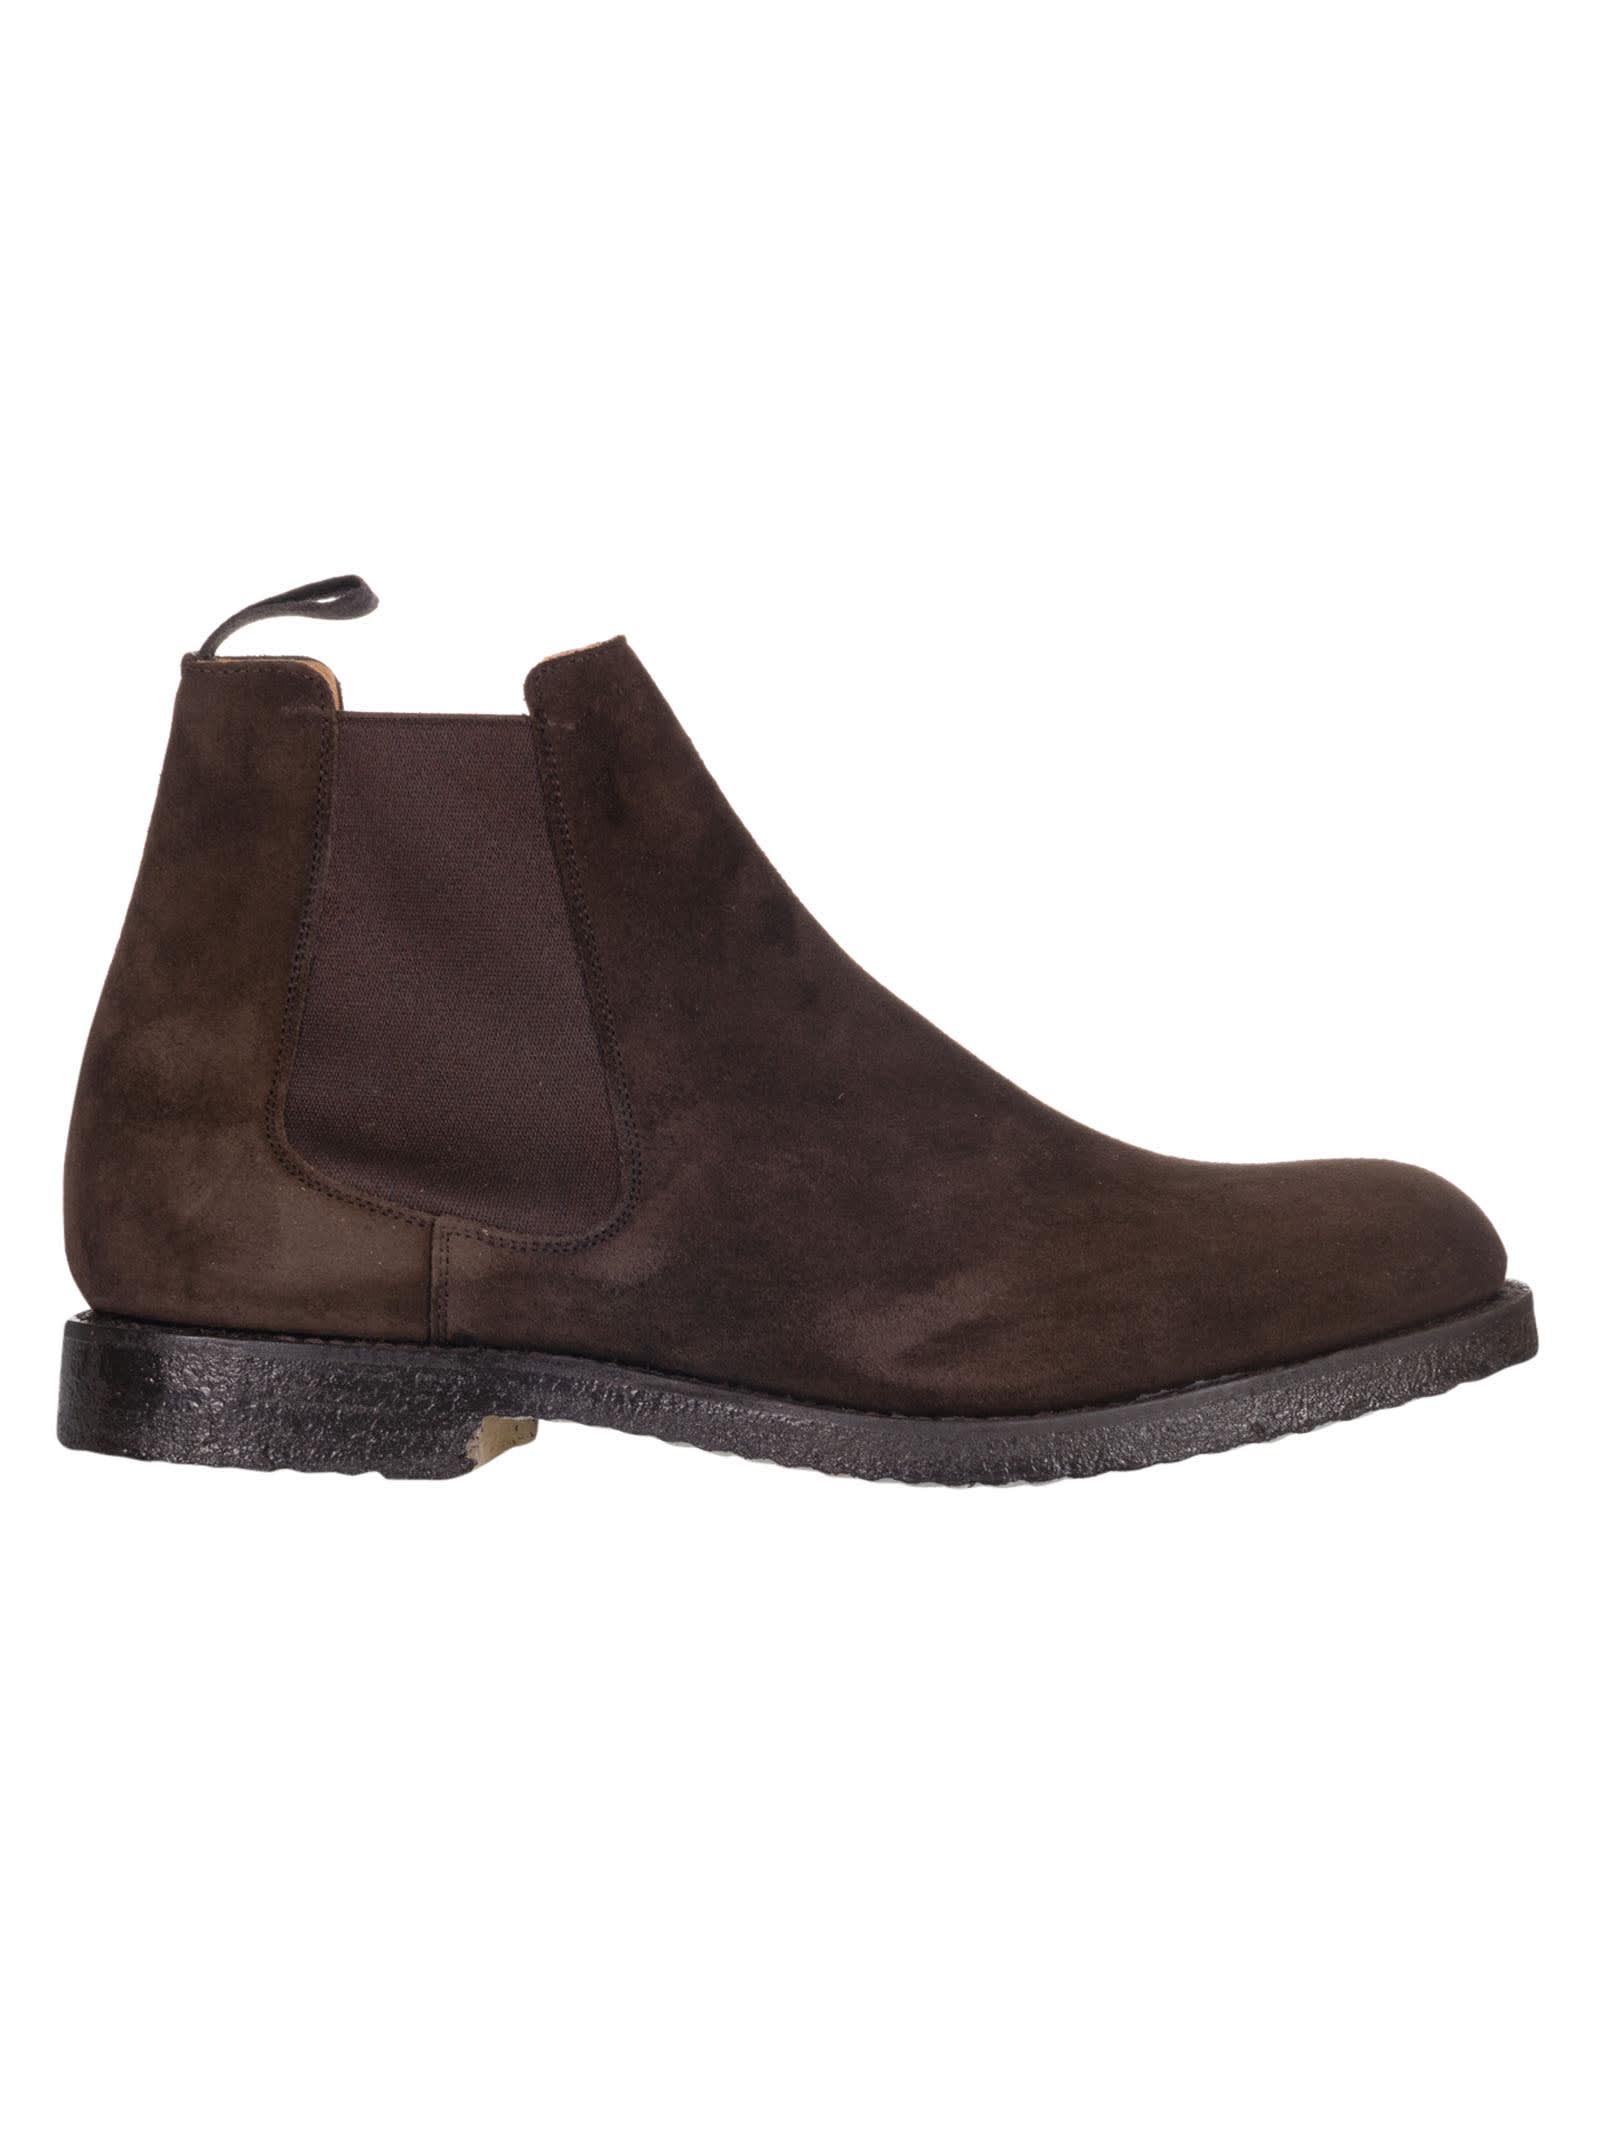 Churchs Greenok Boots